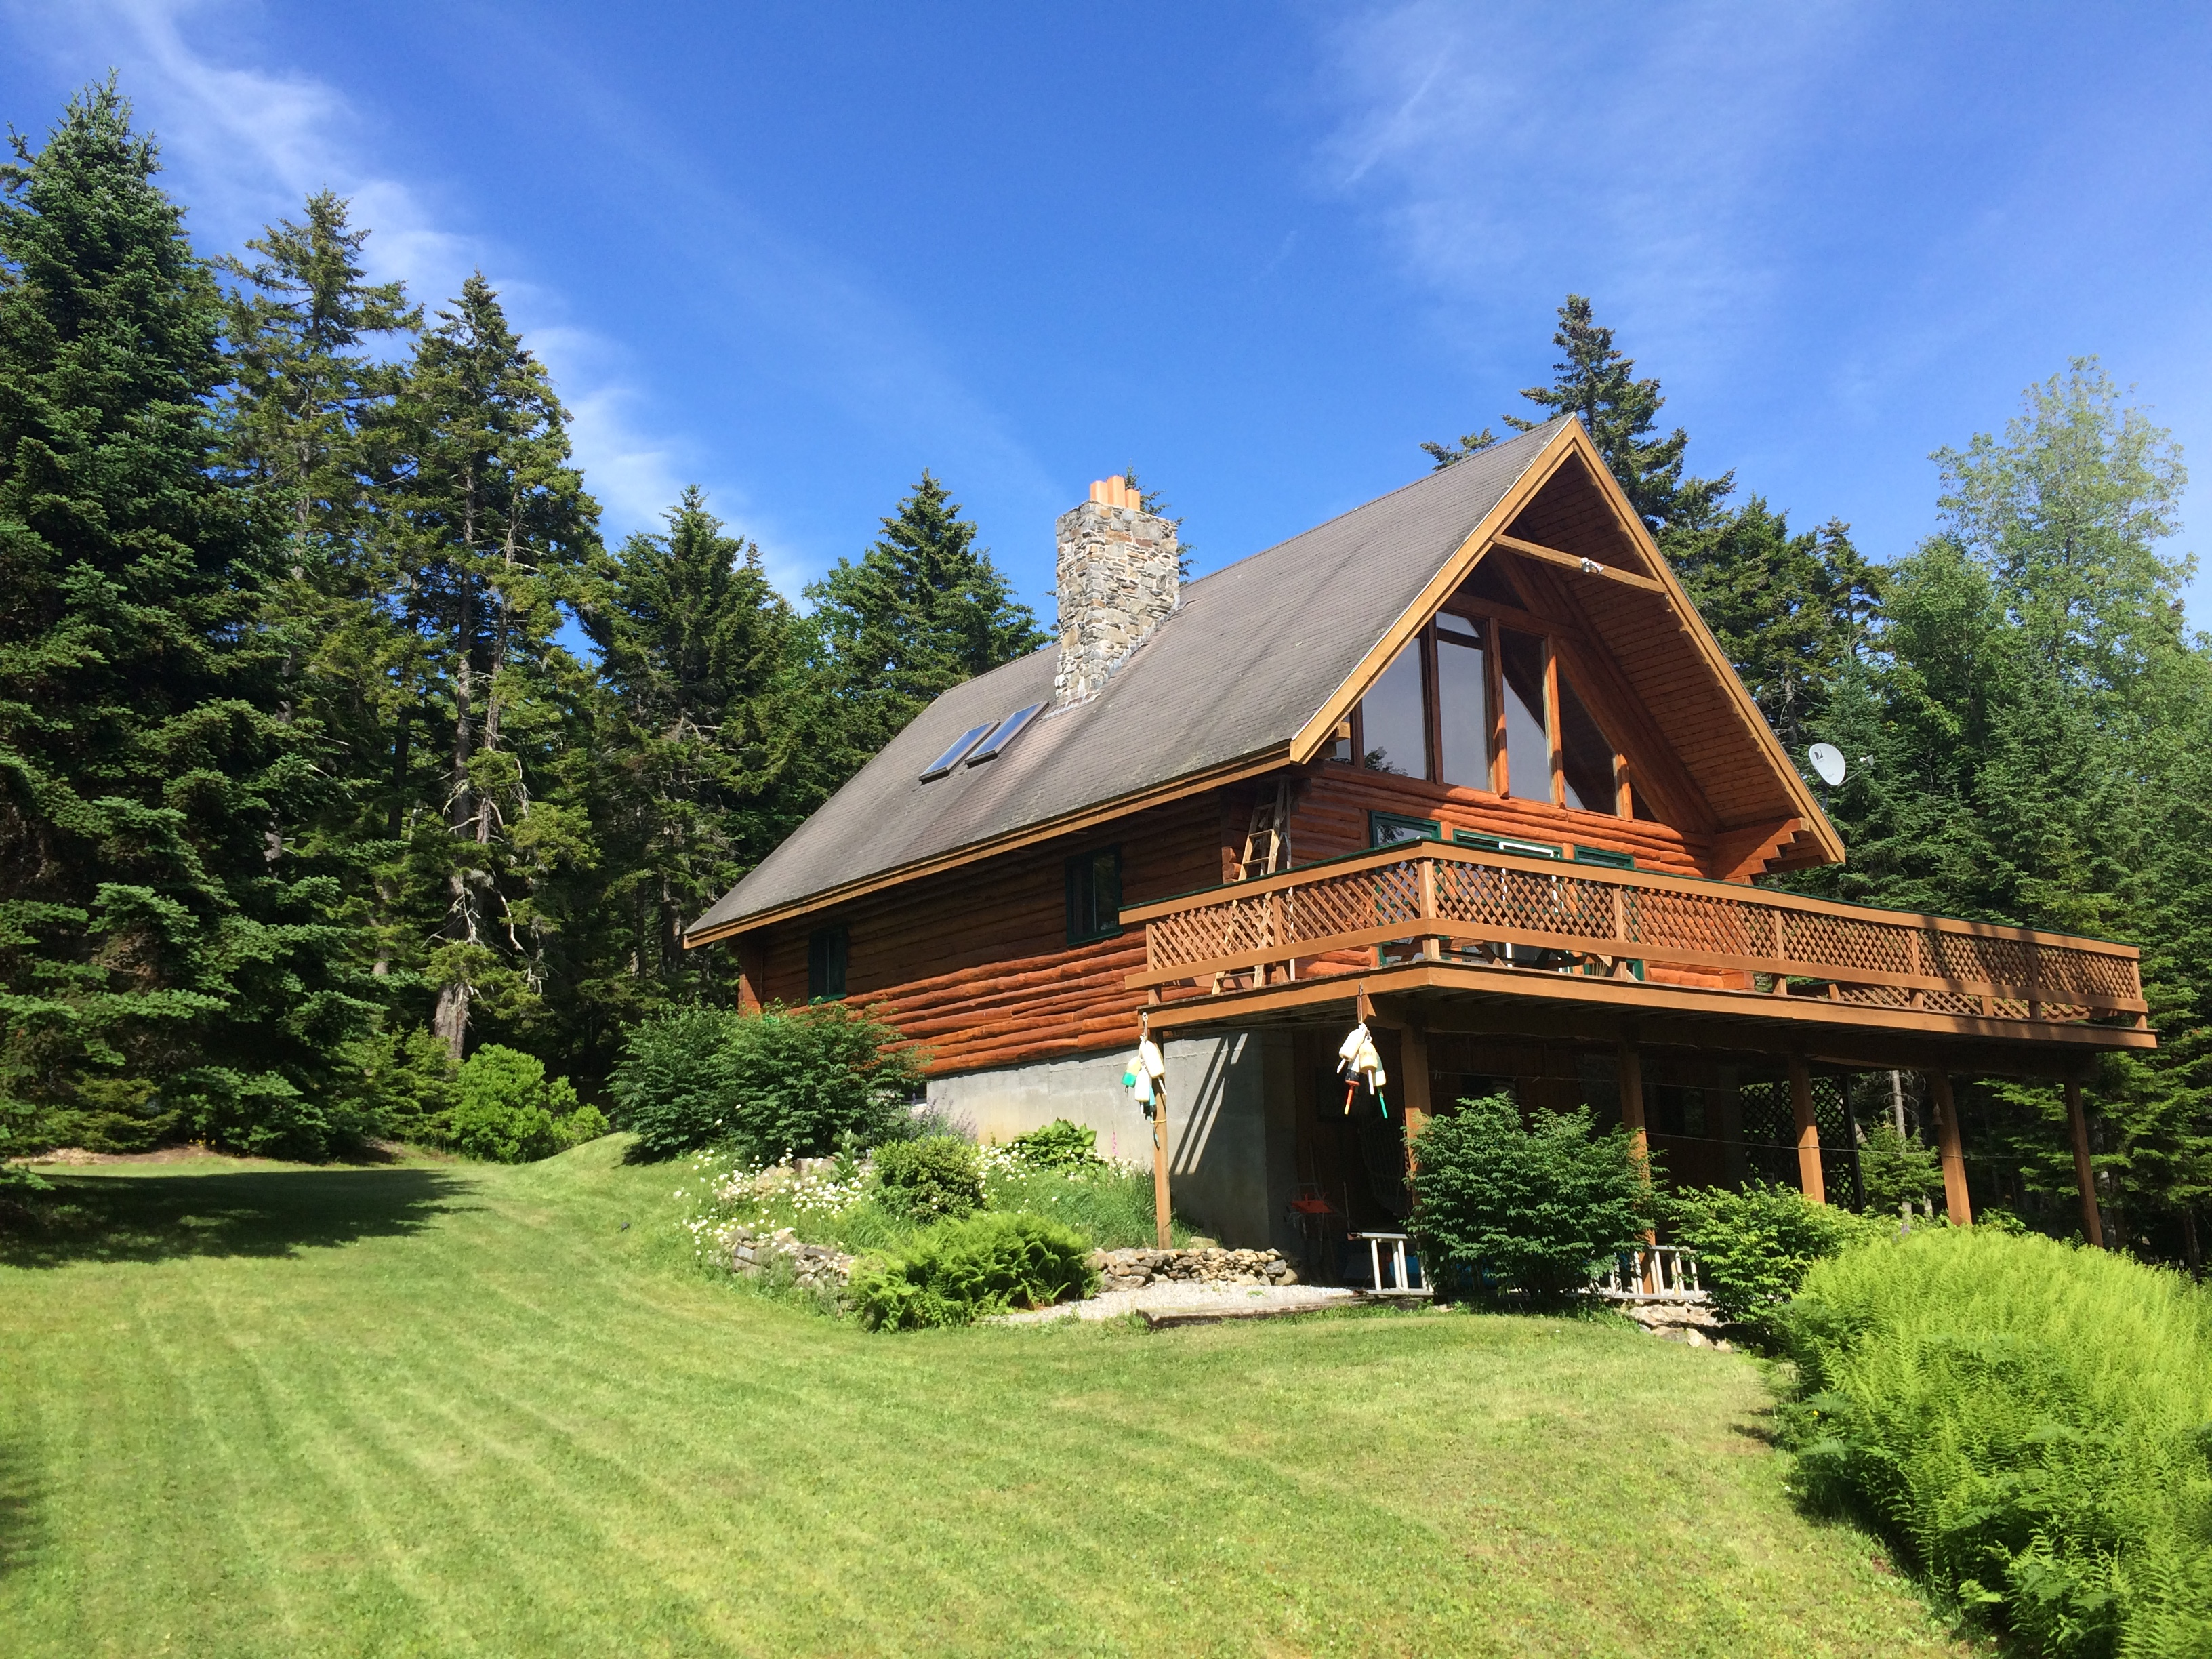 Single Family Home for Sale at Island Log Retreat 1101 Ellis Lane Islesboro, Maine, 04848 United States